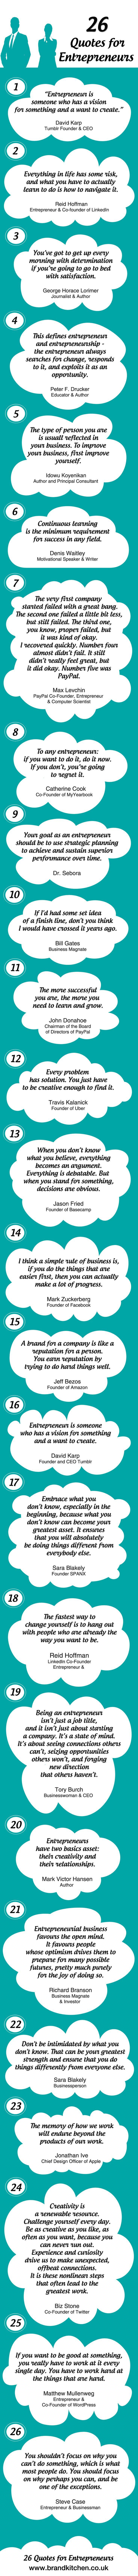 26 Quotes For Entrepreneurs #quotes #infograpics #entrepreneurs #mumpreneurs